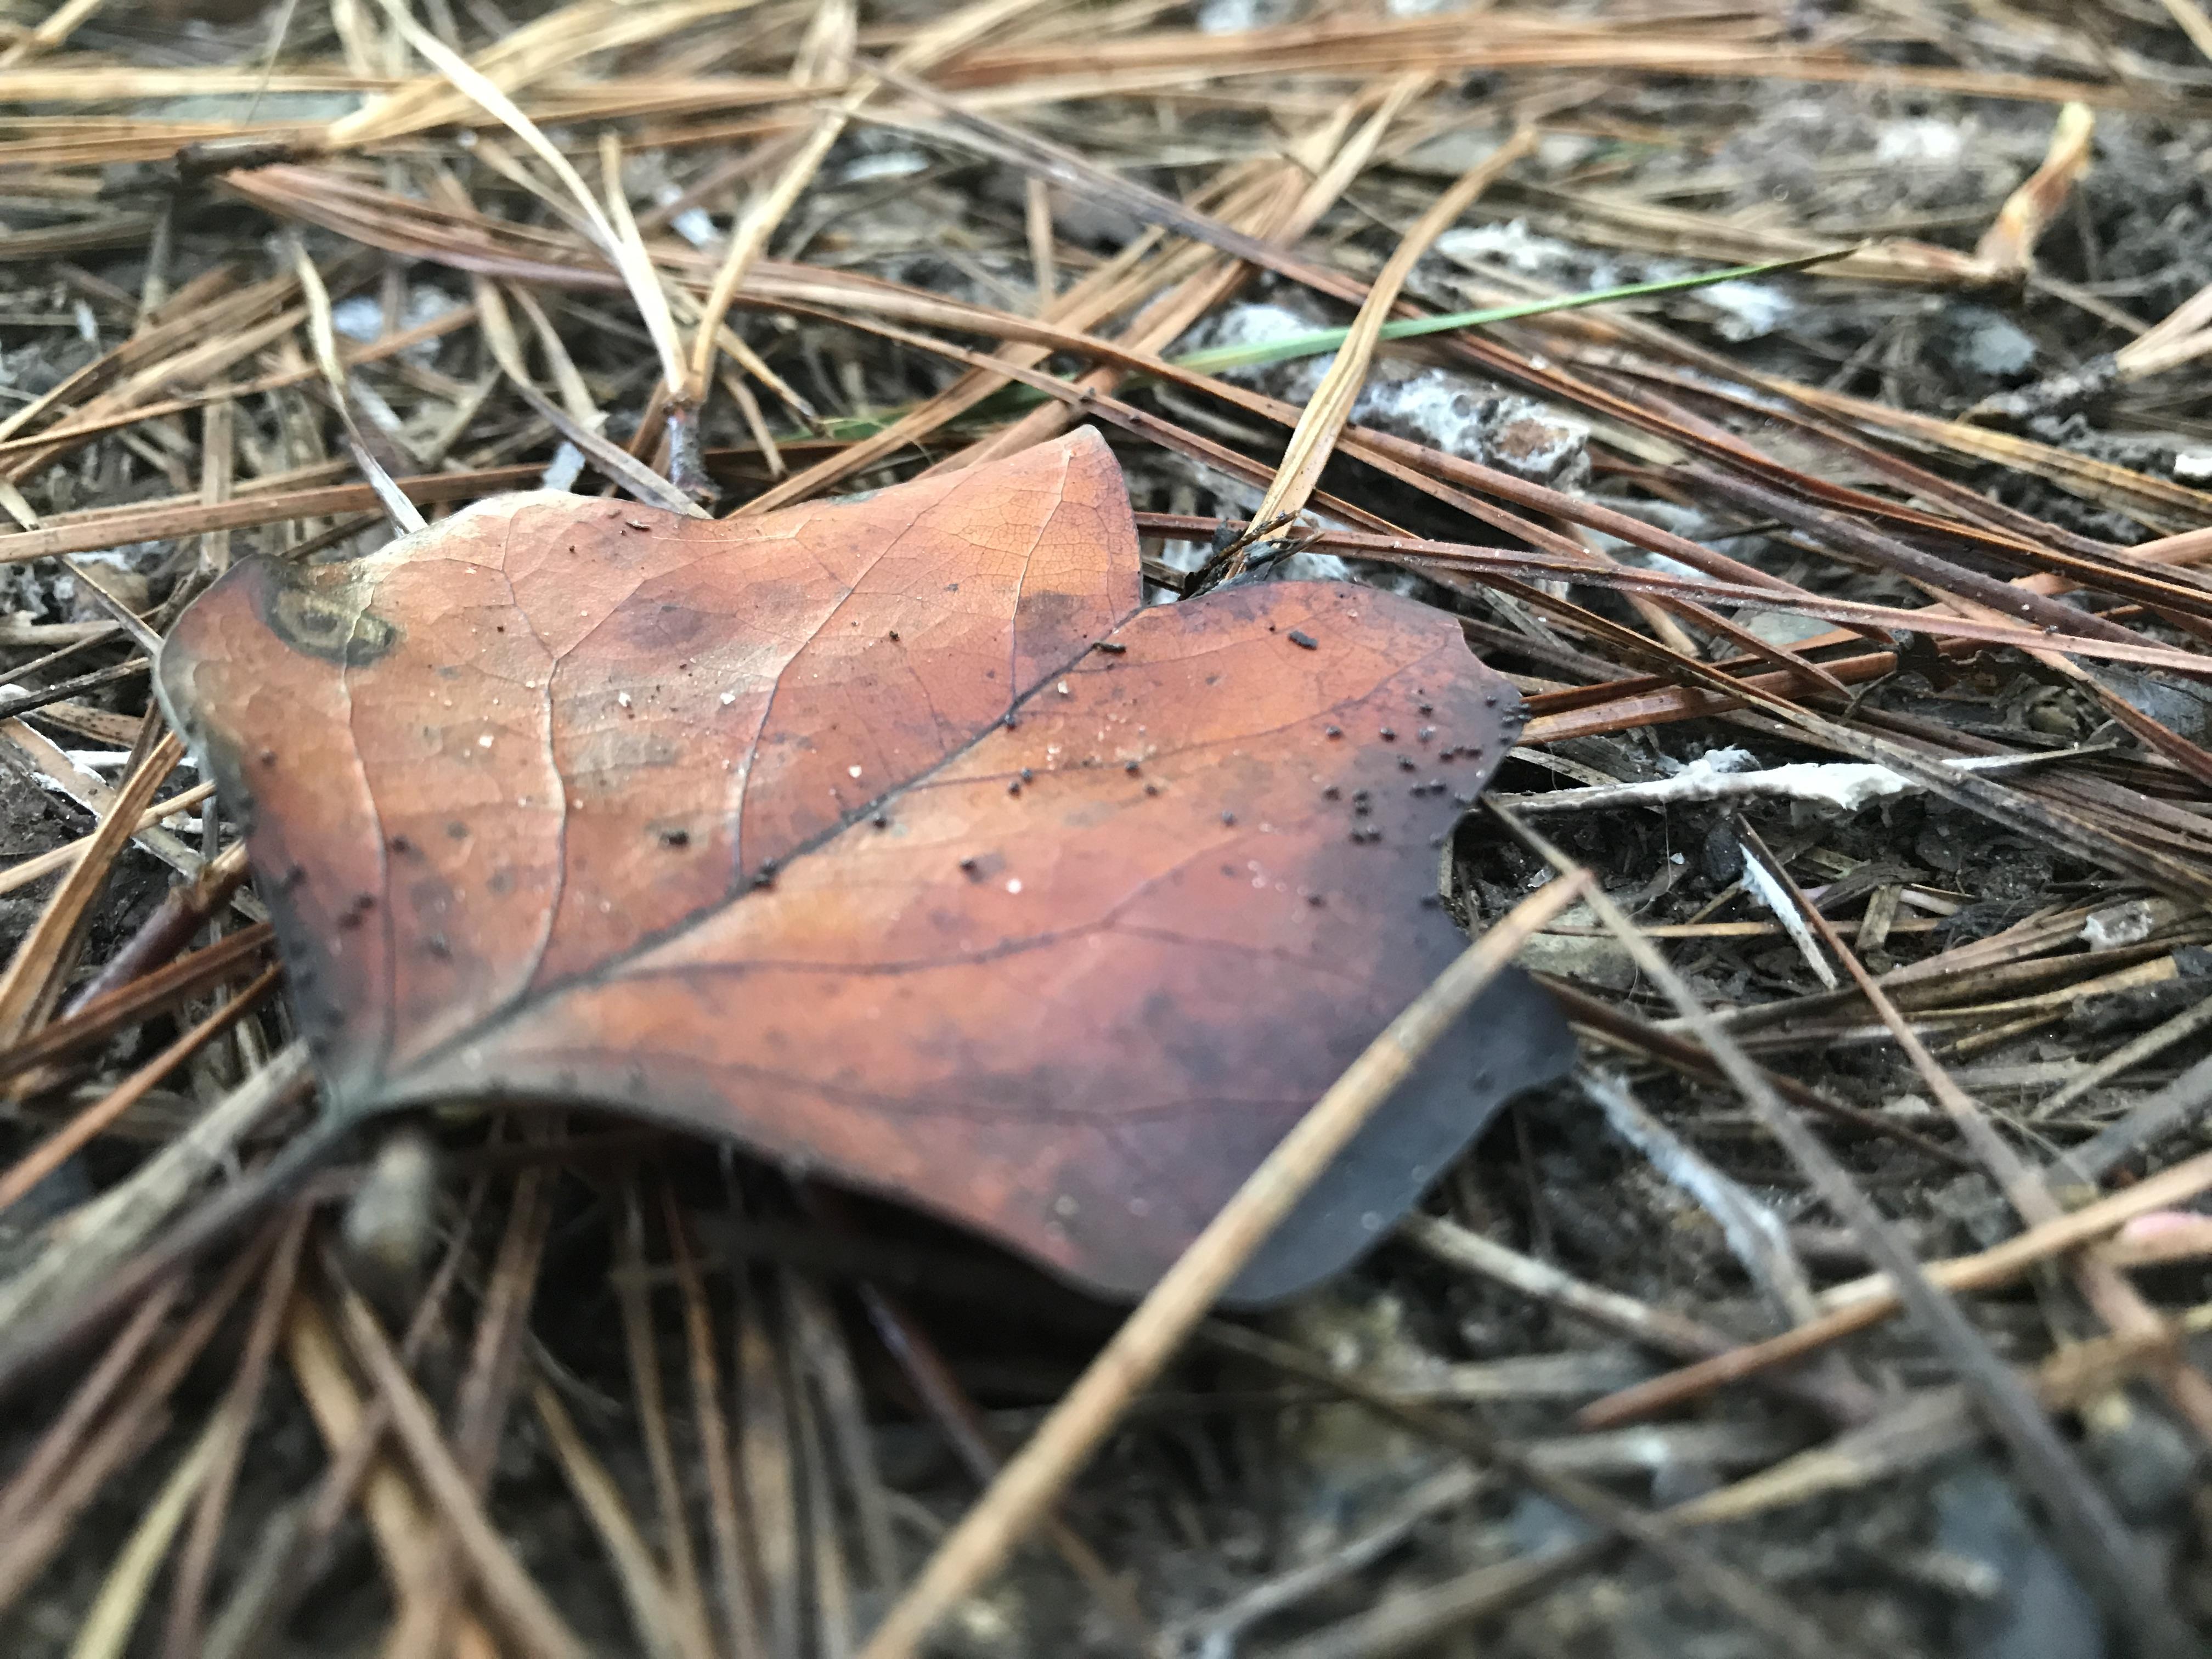 "<div class=""meta image-caption""><div class=""origin-logo origin-image none""><span>none</span></div><span class=""caption-text"">Enjoying the first day of fall at Lake Johnson (WTVD photo/Bob Gaughran)</span></div>"